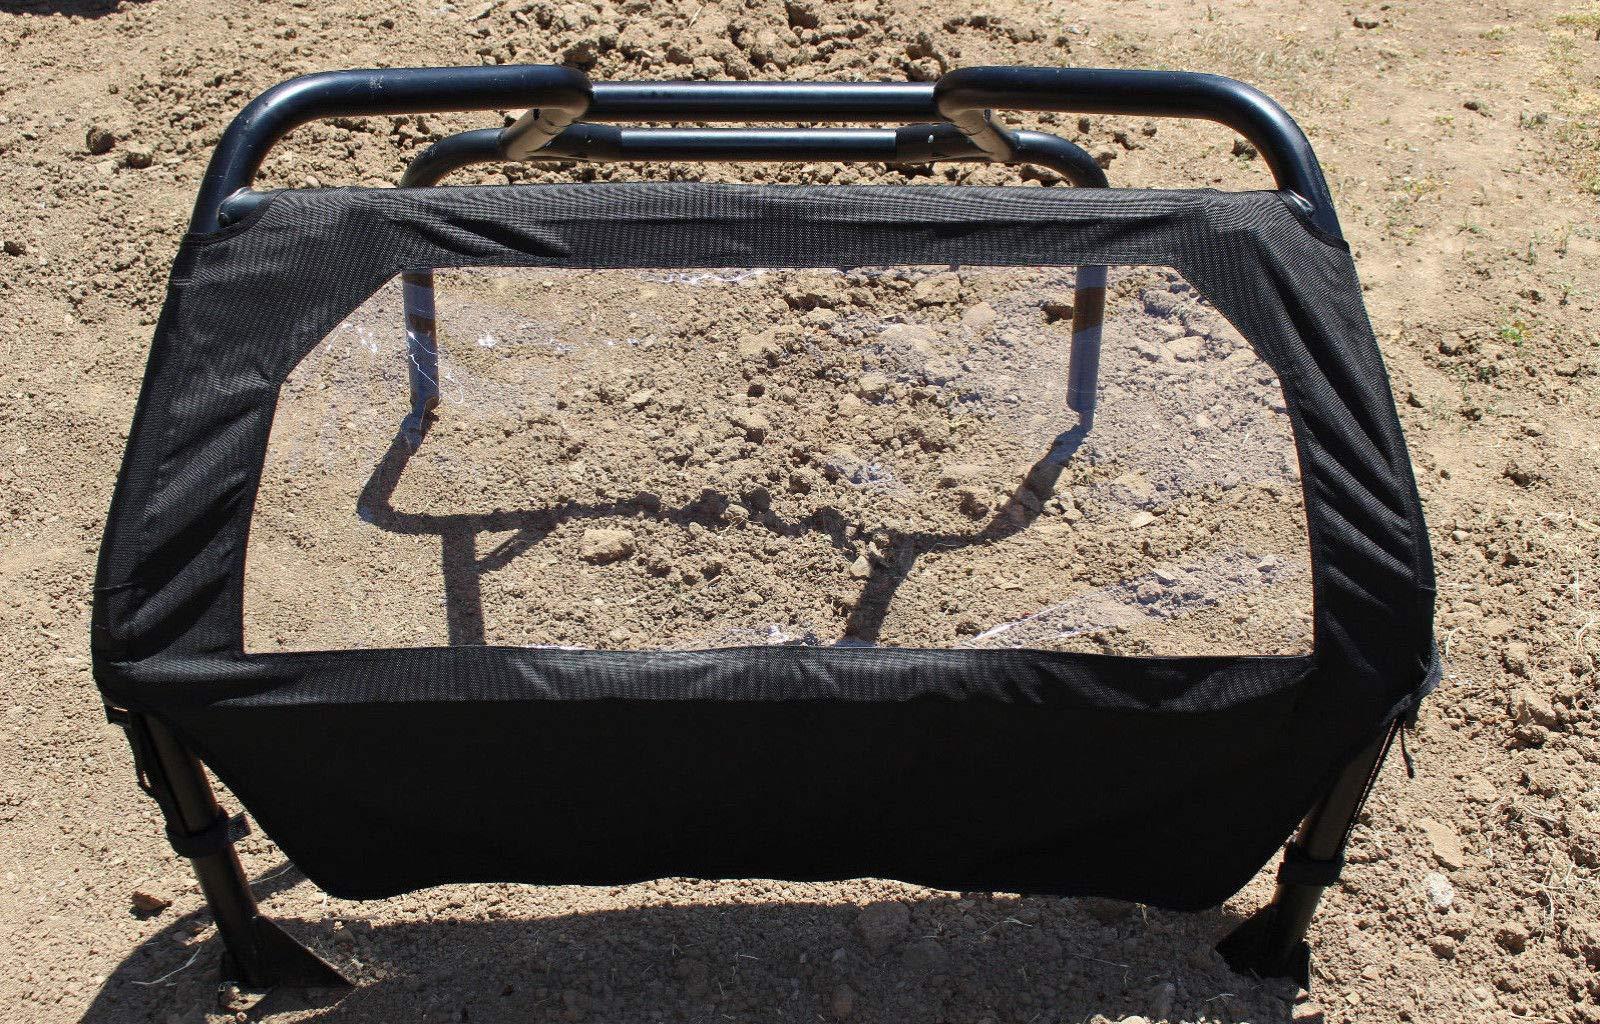 Dirt Specialties New Polaris RZR 800, 800S XP900, XP4 900 570 Rear Window/Cover 2008-17 by Dirt Specialties (Image #5)